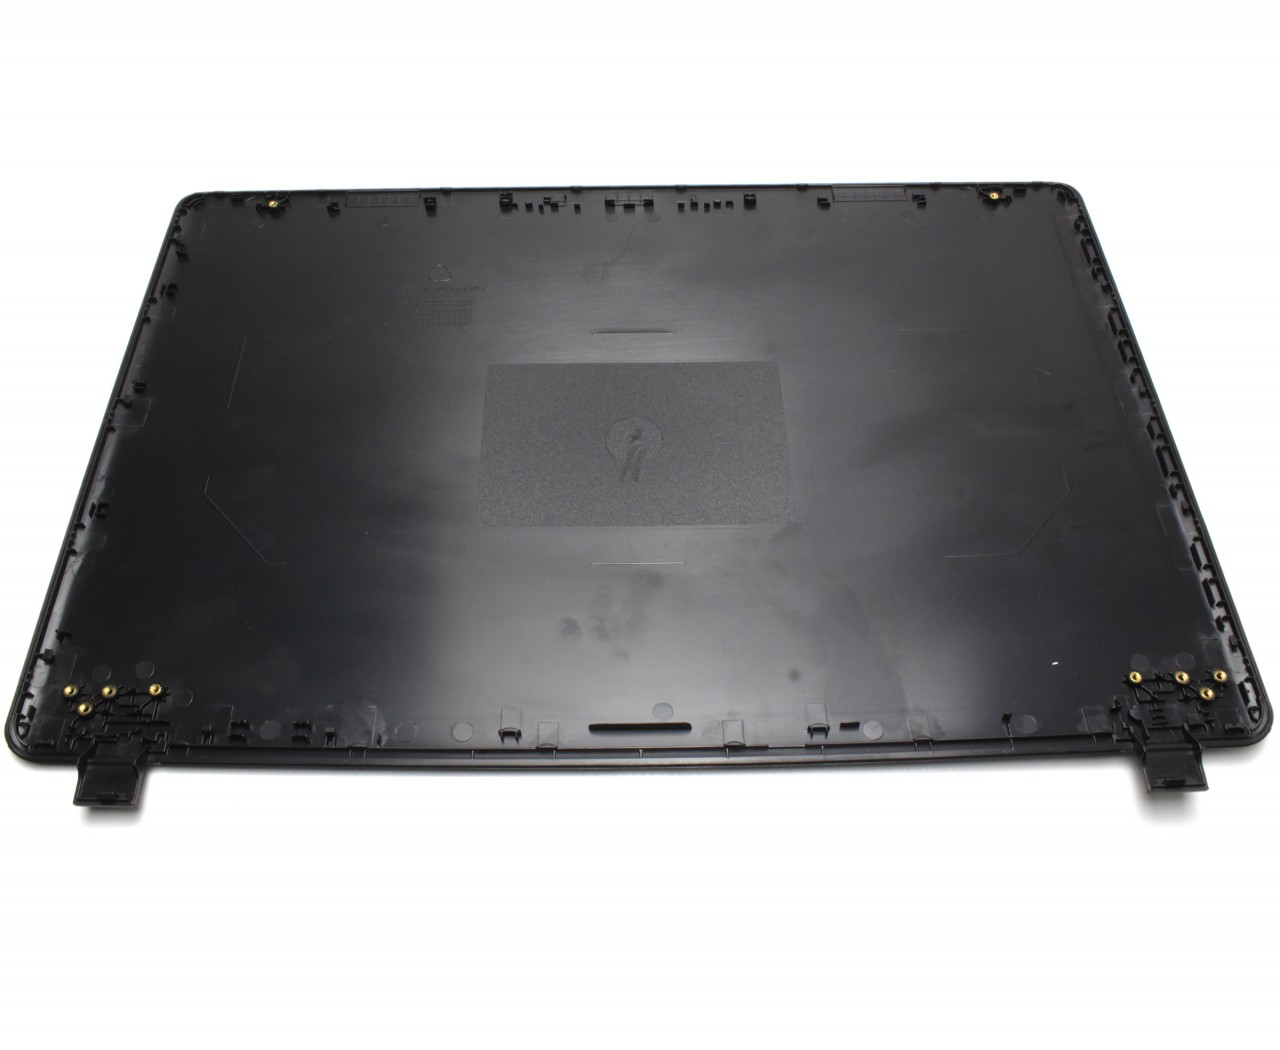 Capac Display BackCover Acer Aspire ES1-572 Carcasa Display imagine powerlaptop.ro 2021